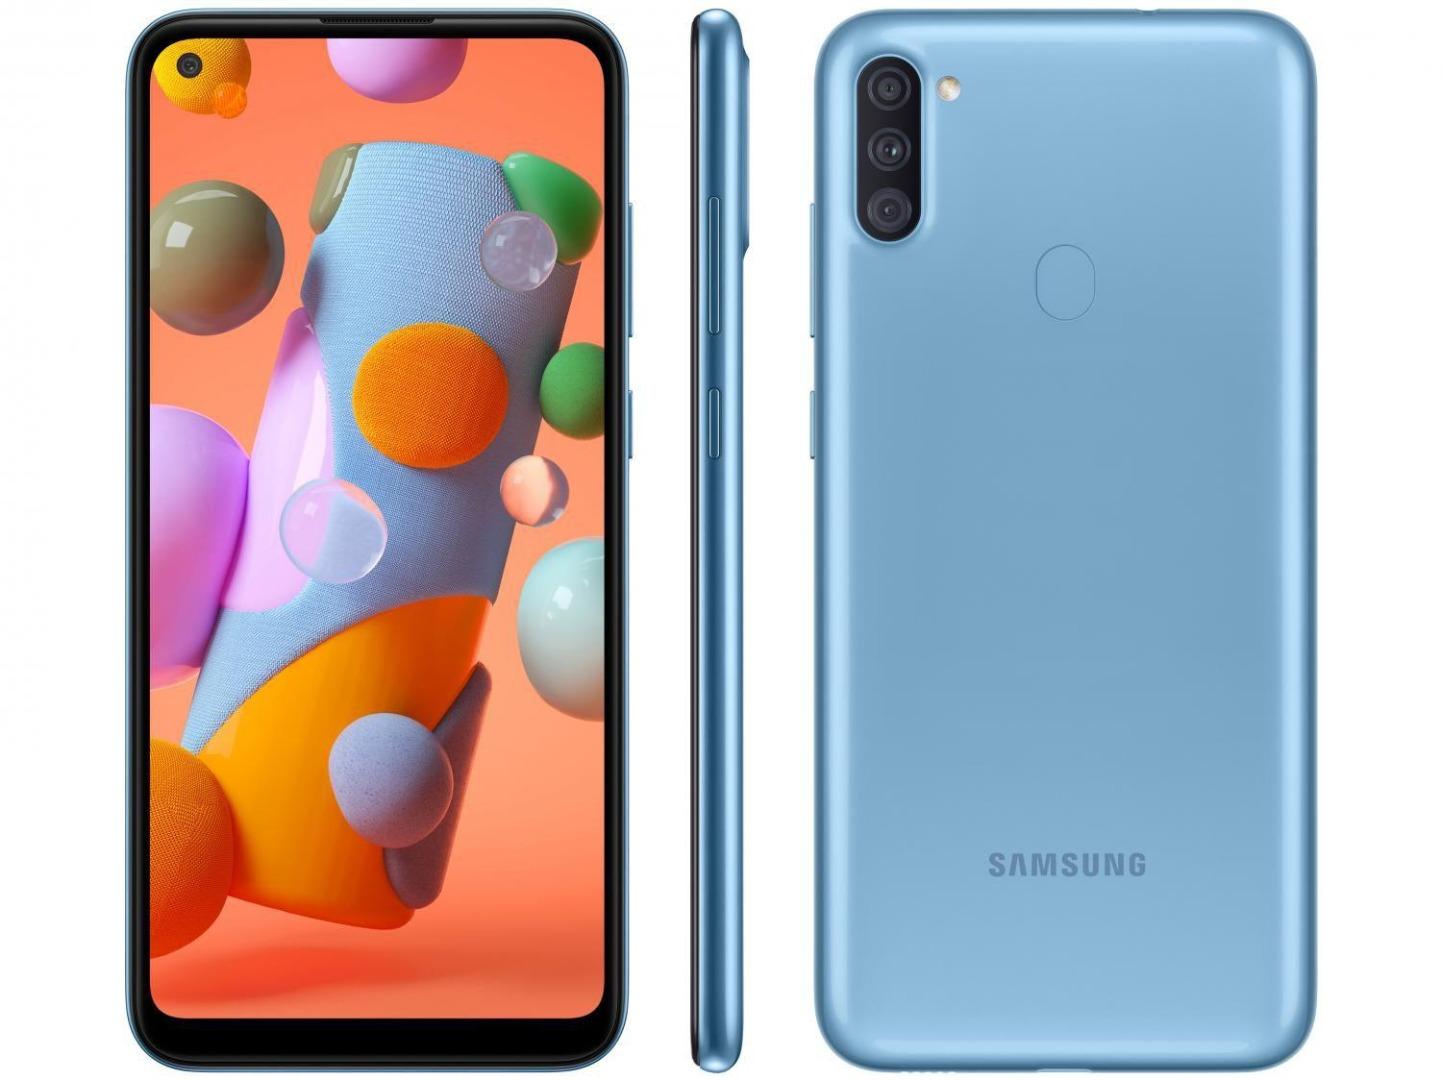 Smartphone Galaxy A11 - Samsung - Azul